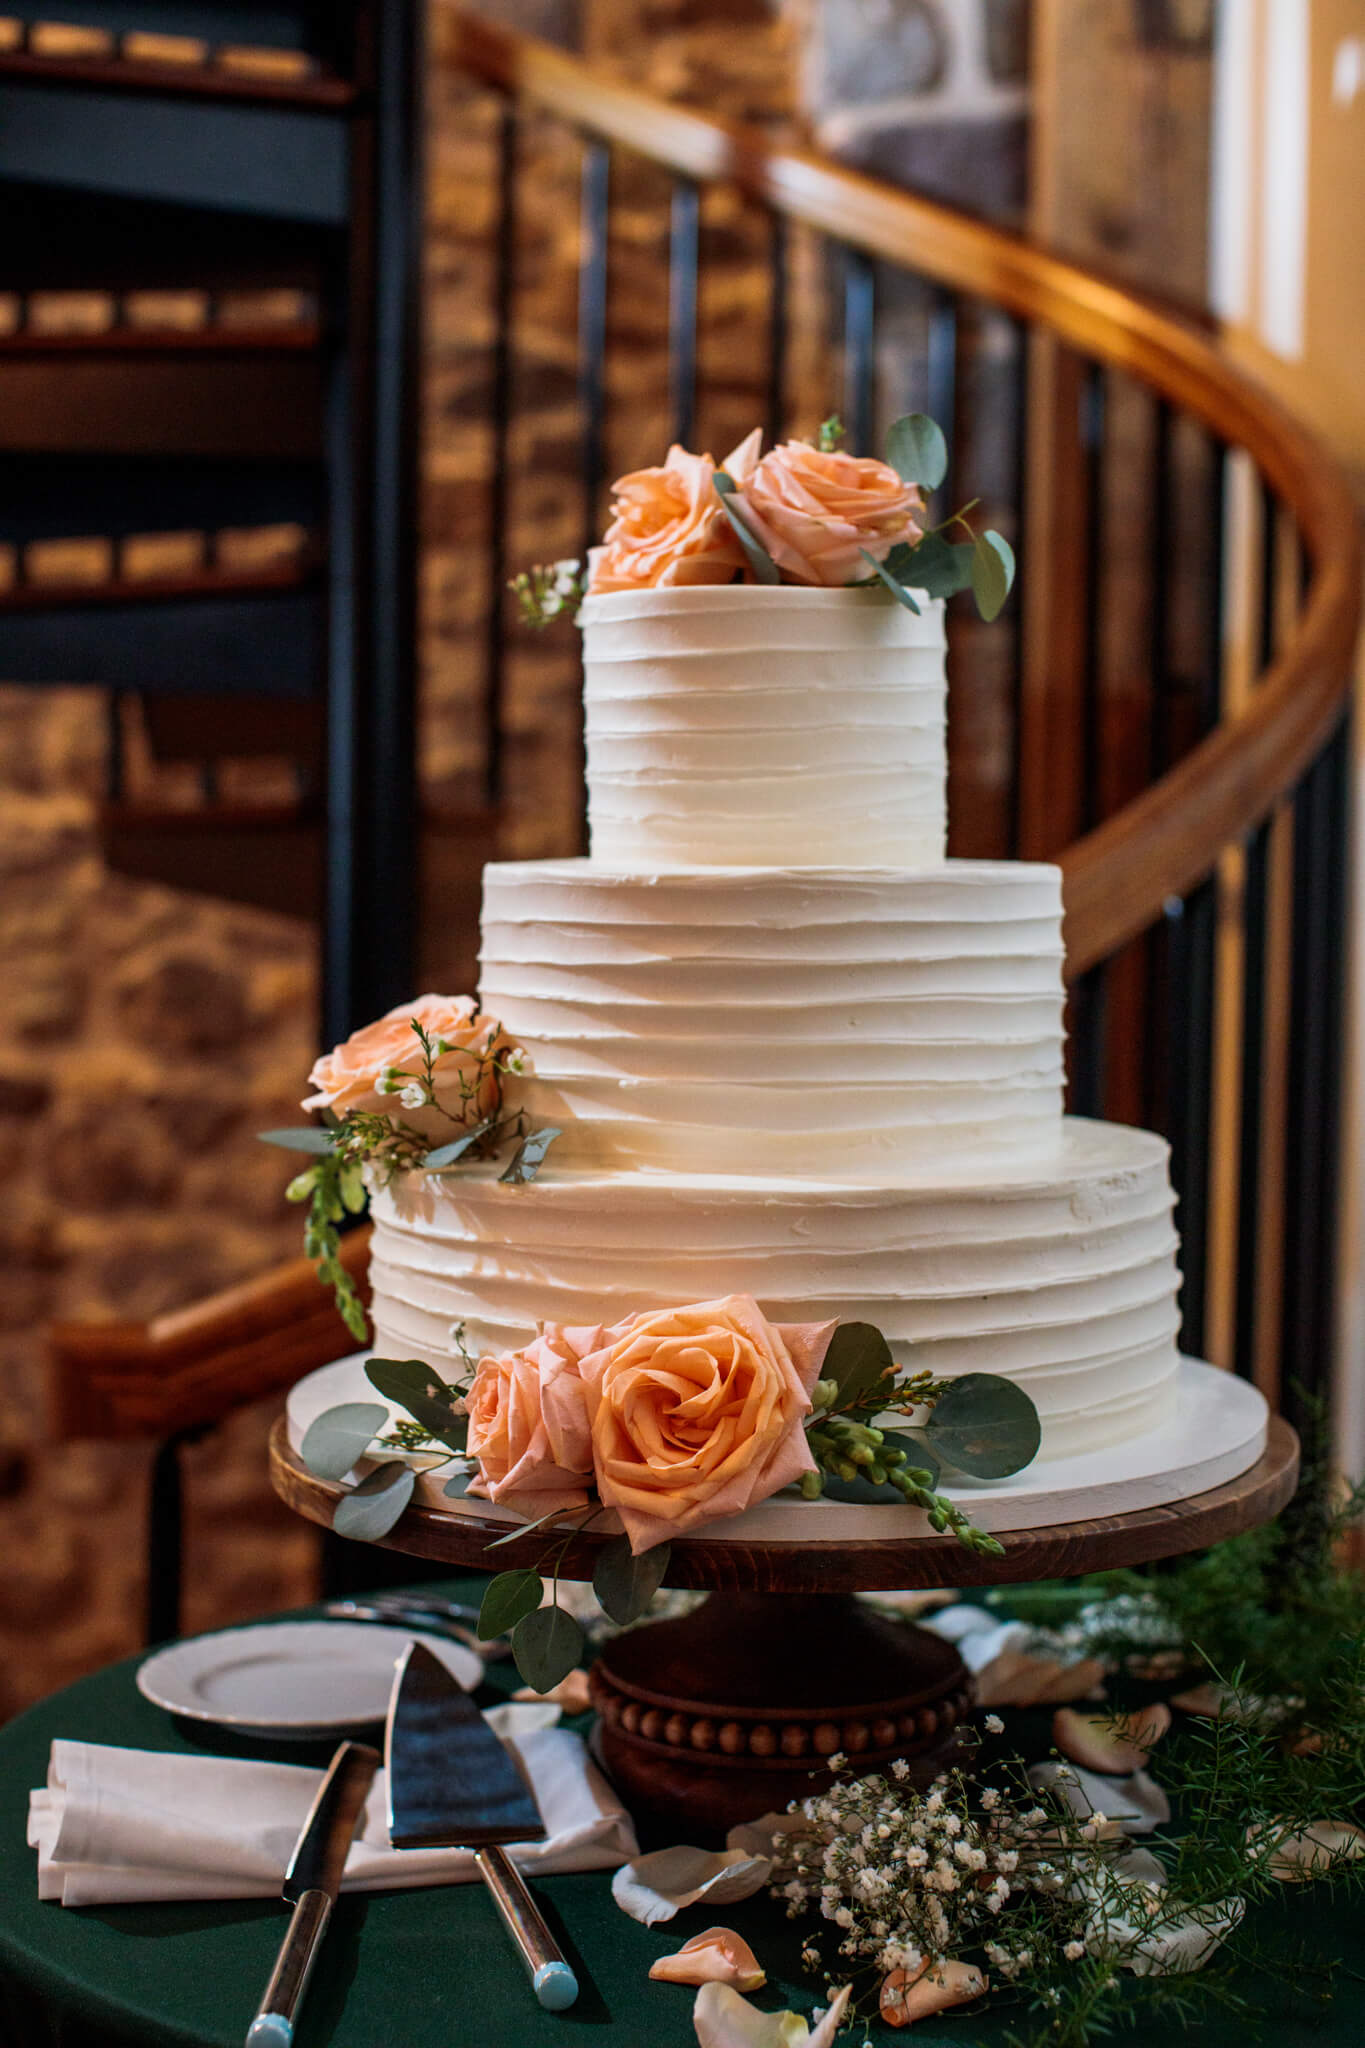 Alysia Jerad Homestead Blessings Farm Hershey PA Wedding Rustic Chique - 87.JPG